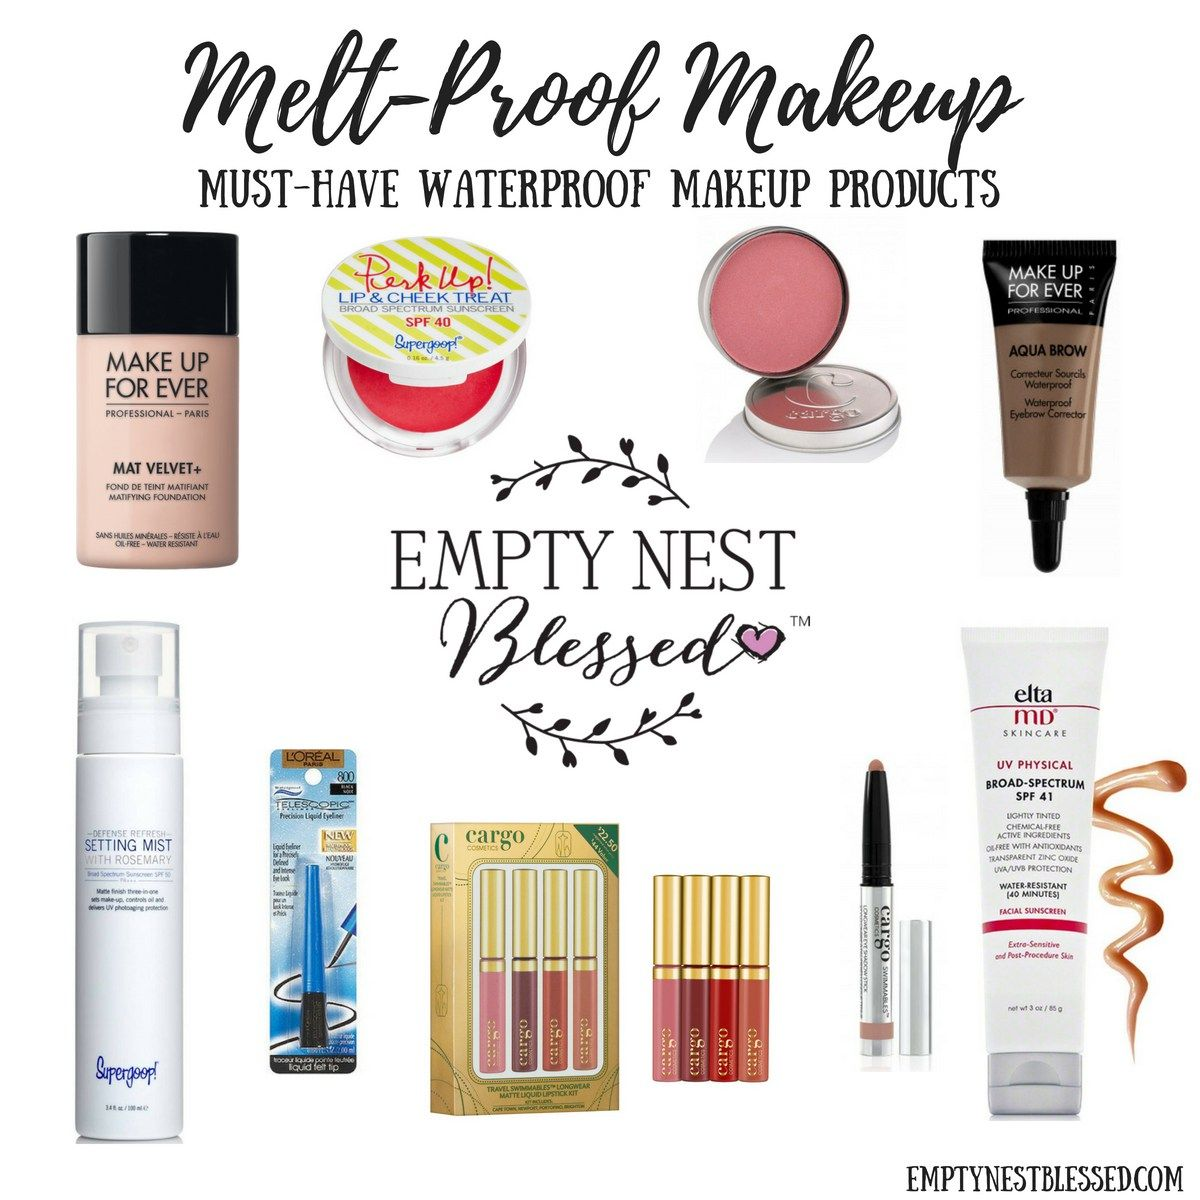 MeltProof Makeup Waterproof makeup, Best waterproof